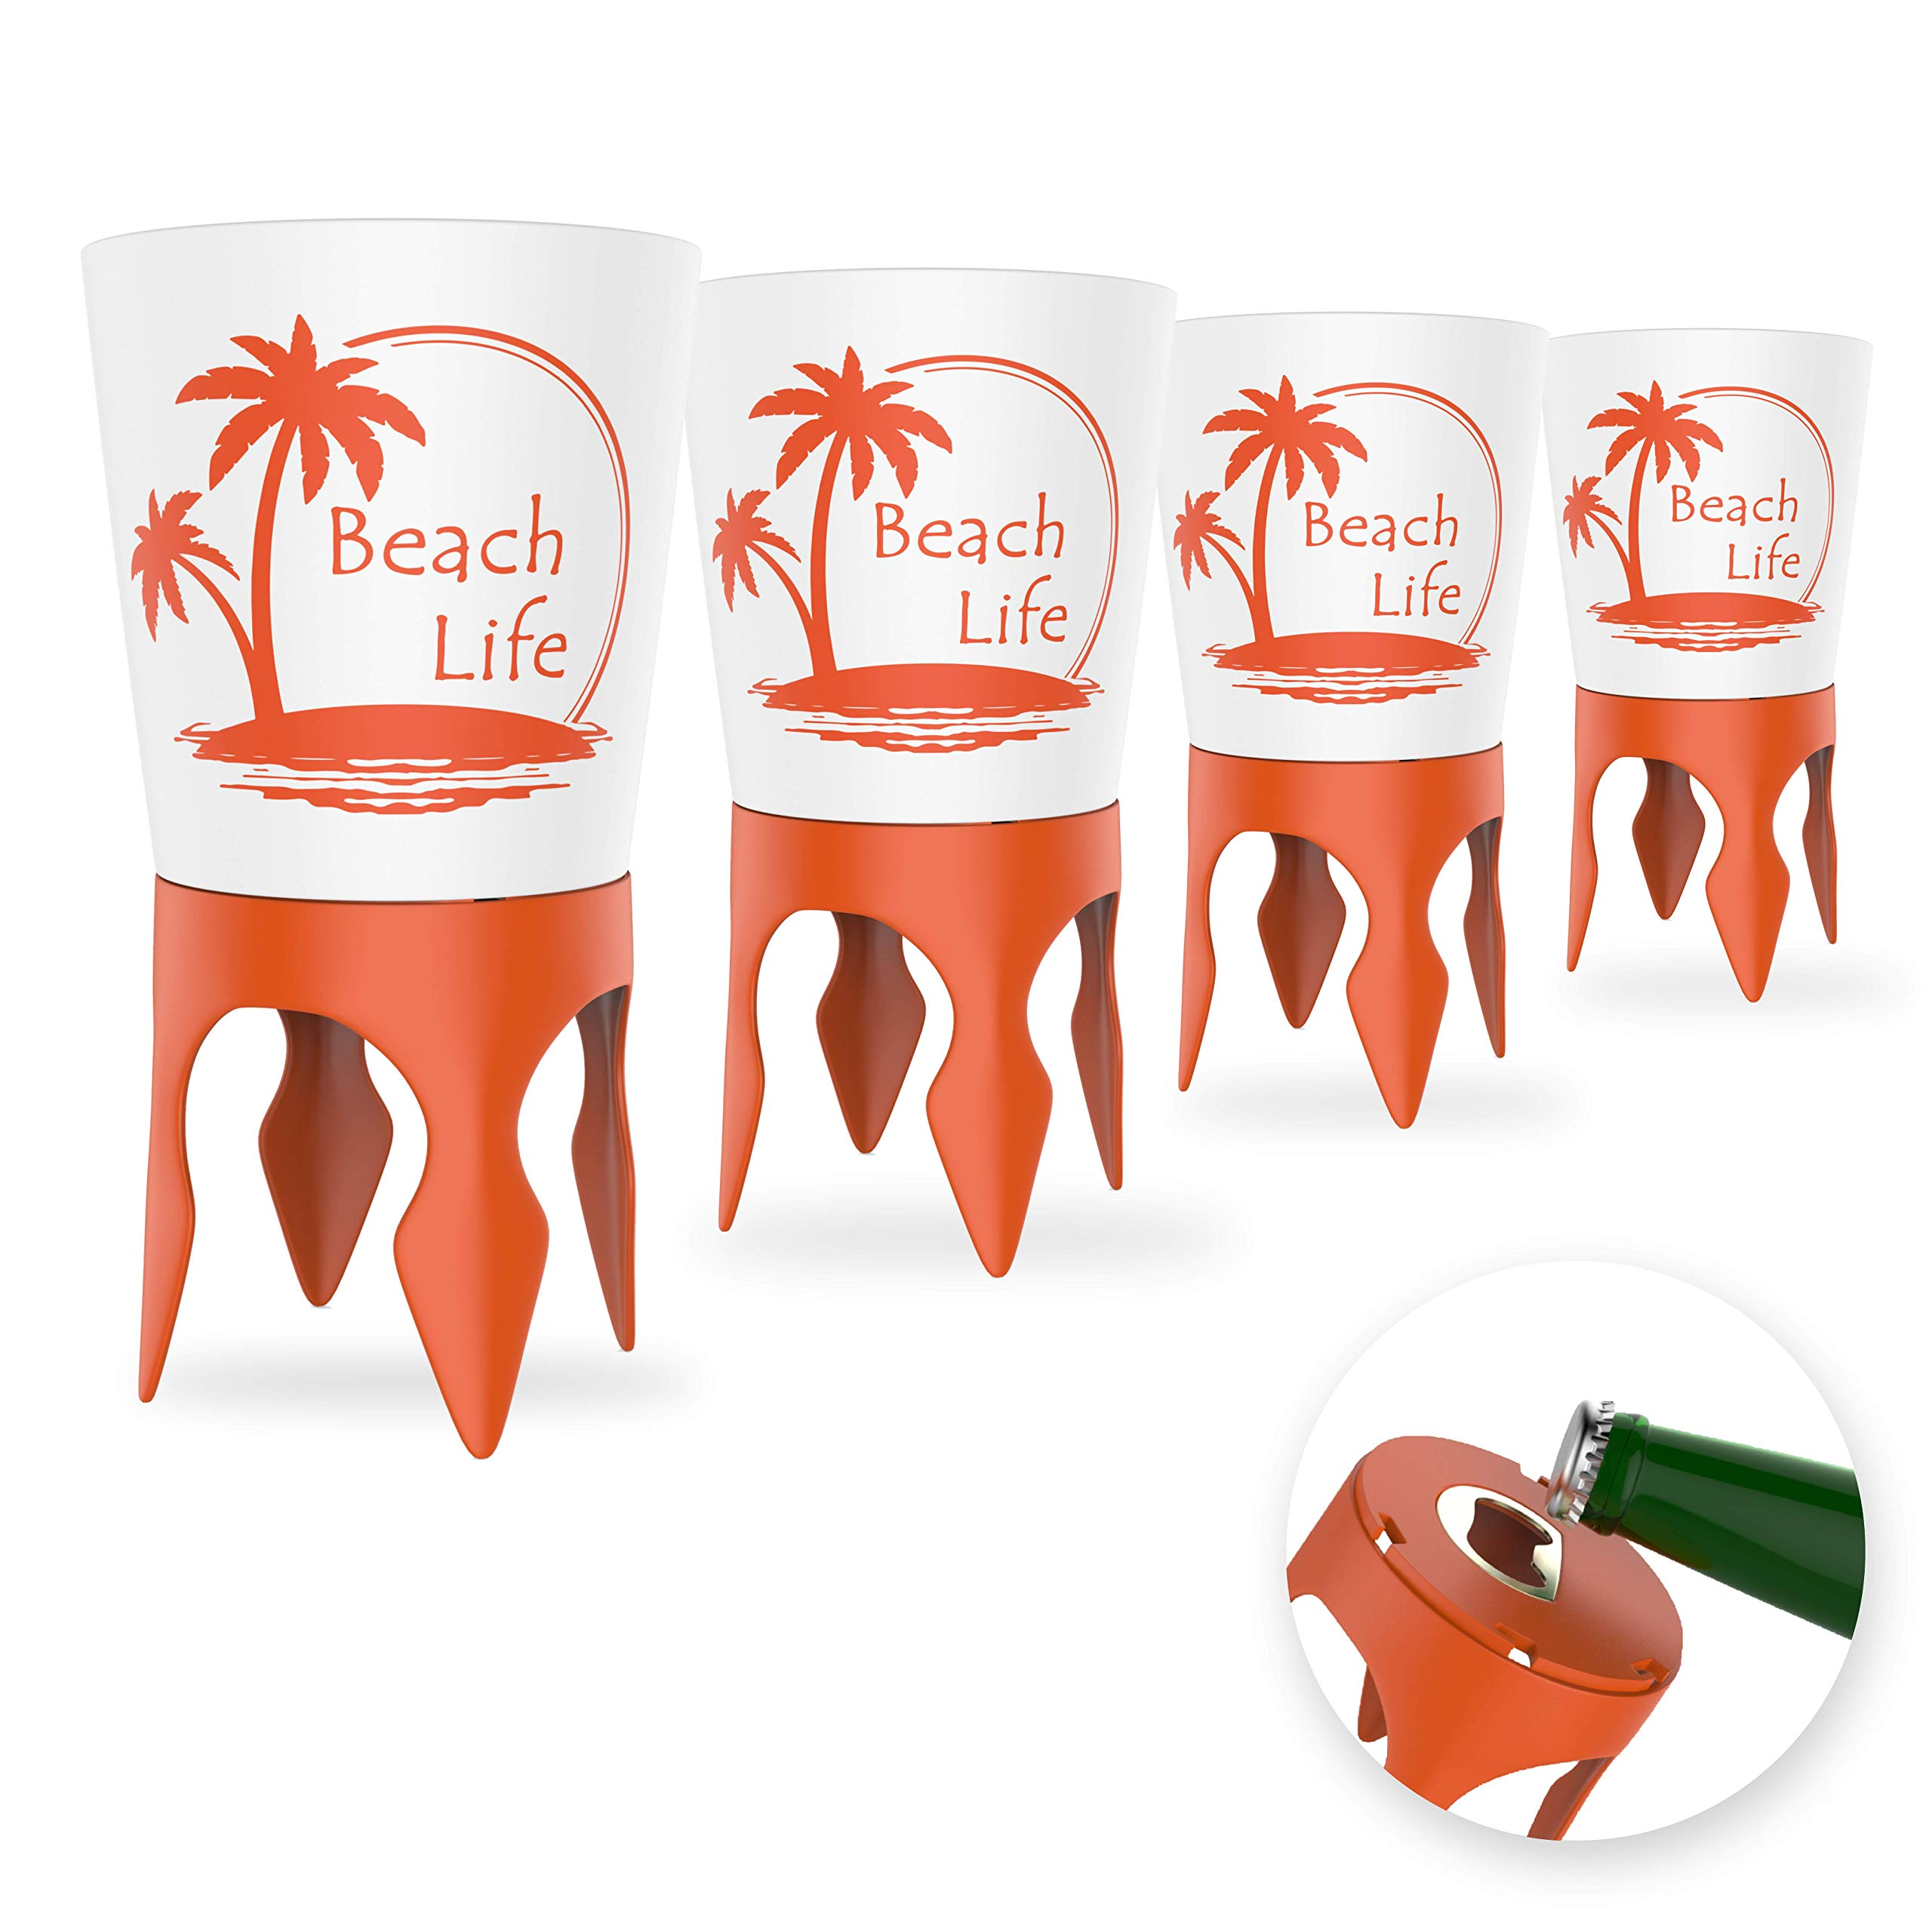 Beach Vacation Turtleback Sand Coaster Drink Cup Holder Orange 4 pack